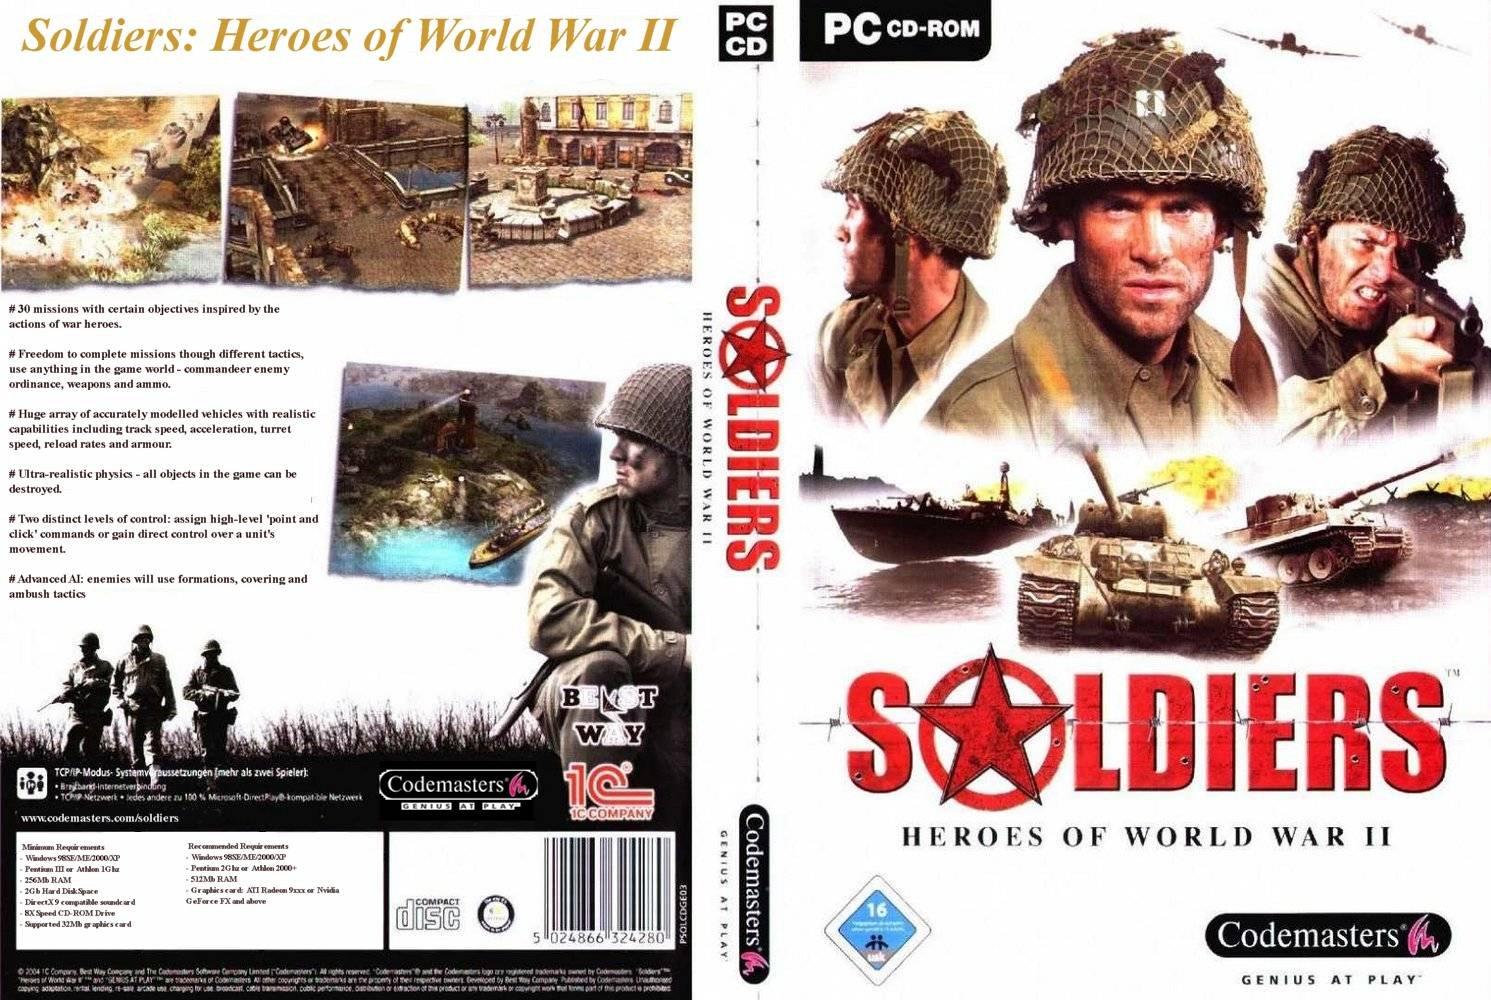 Soldiers heroes of world war ii gameplay